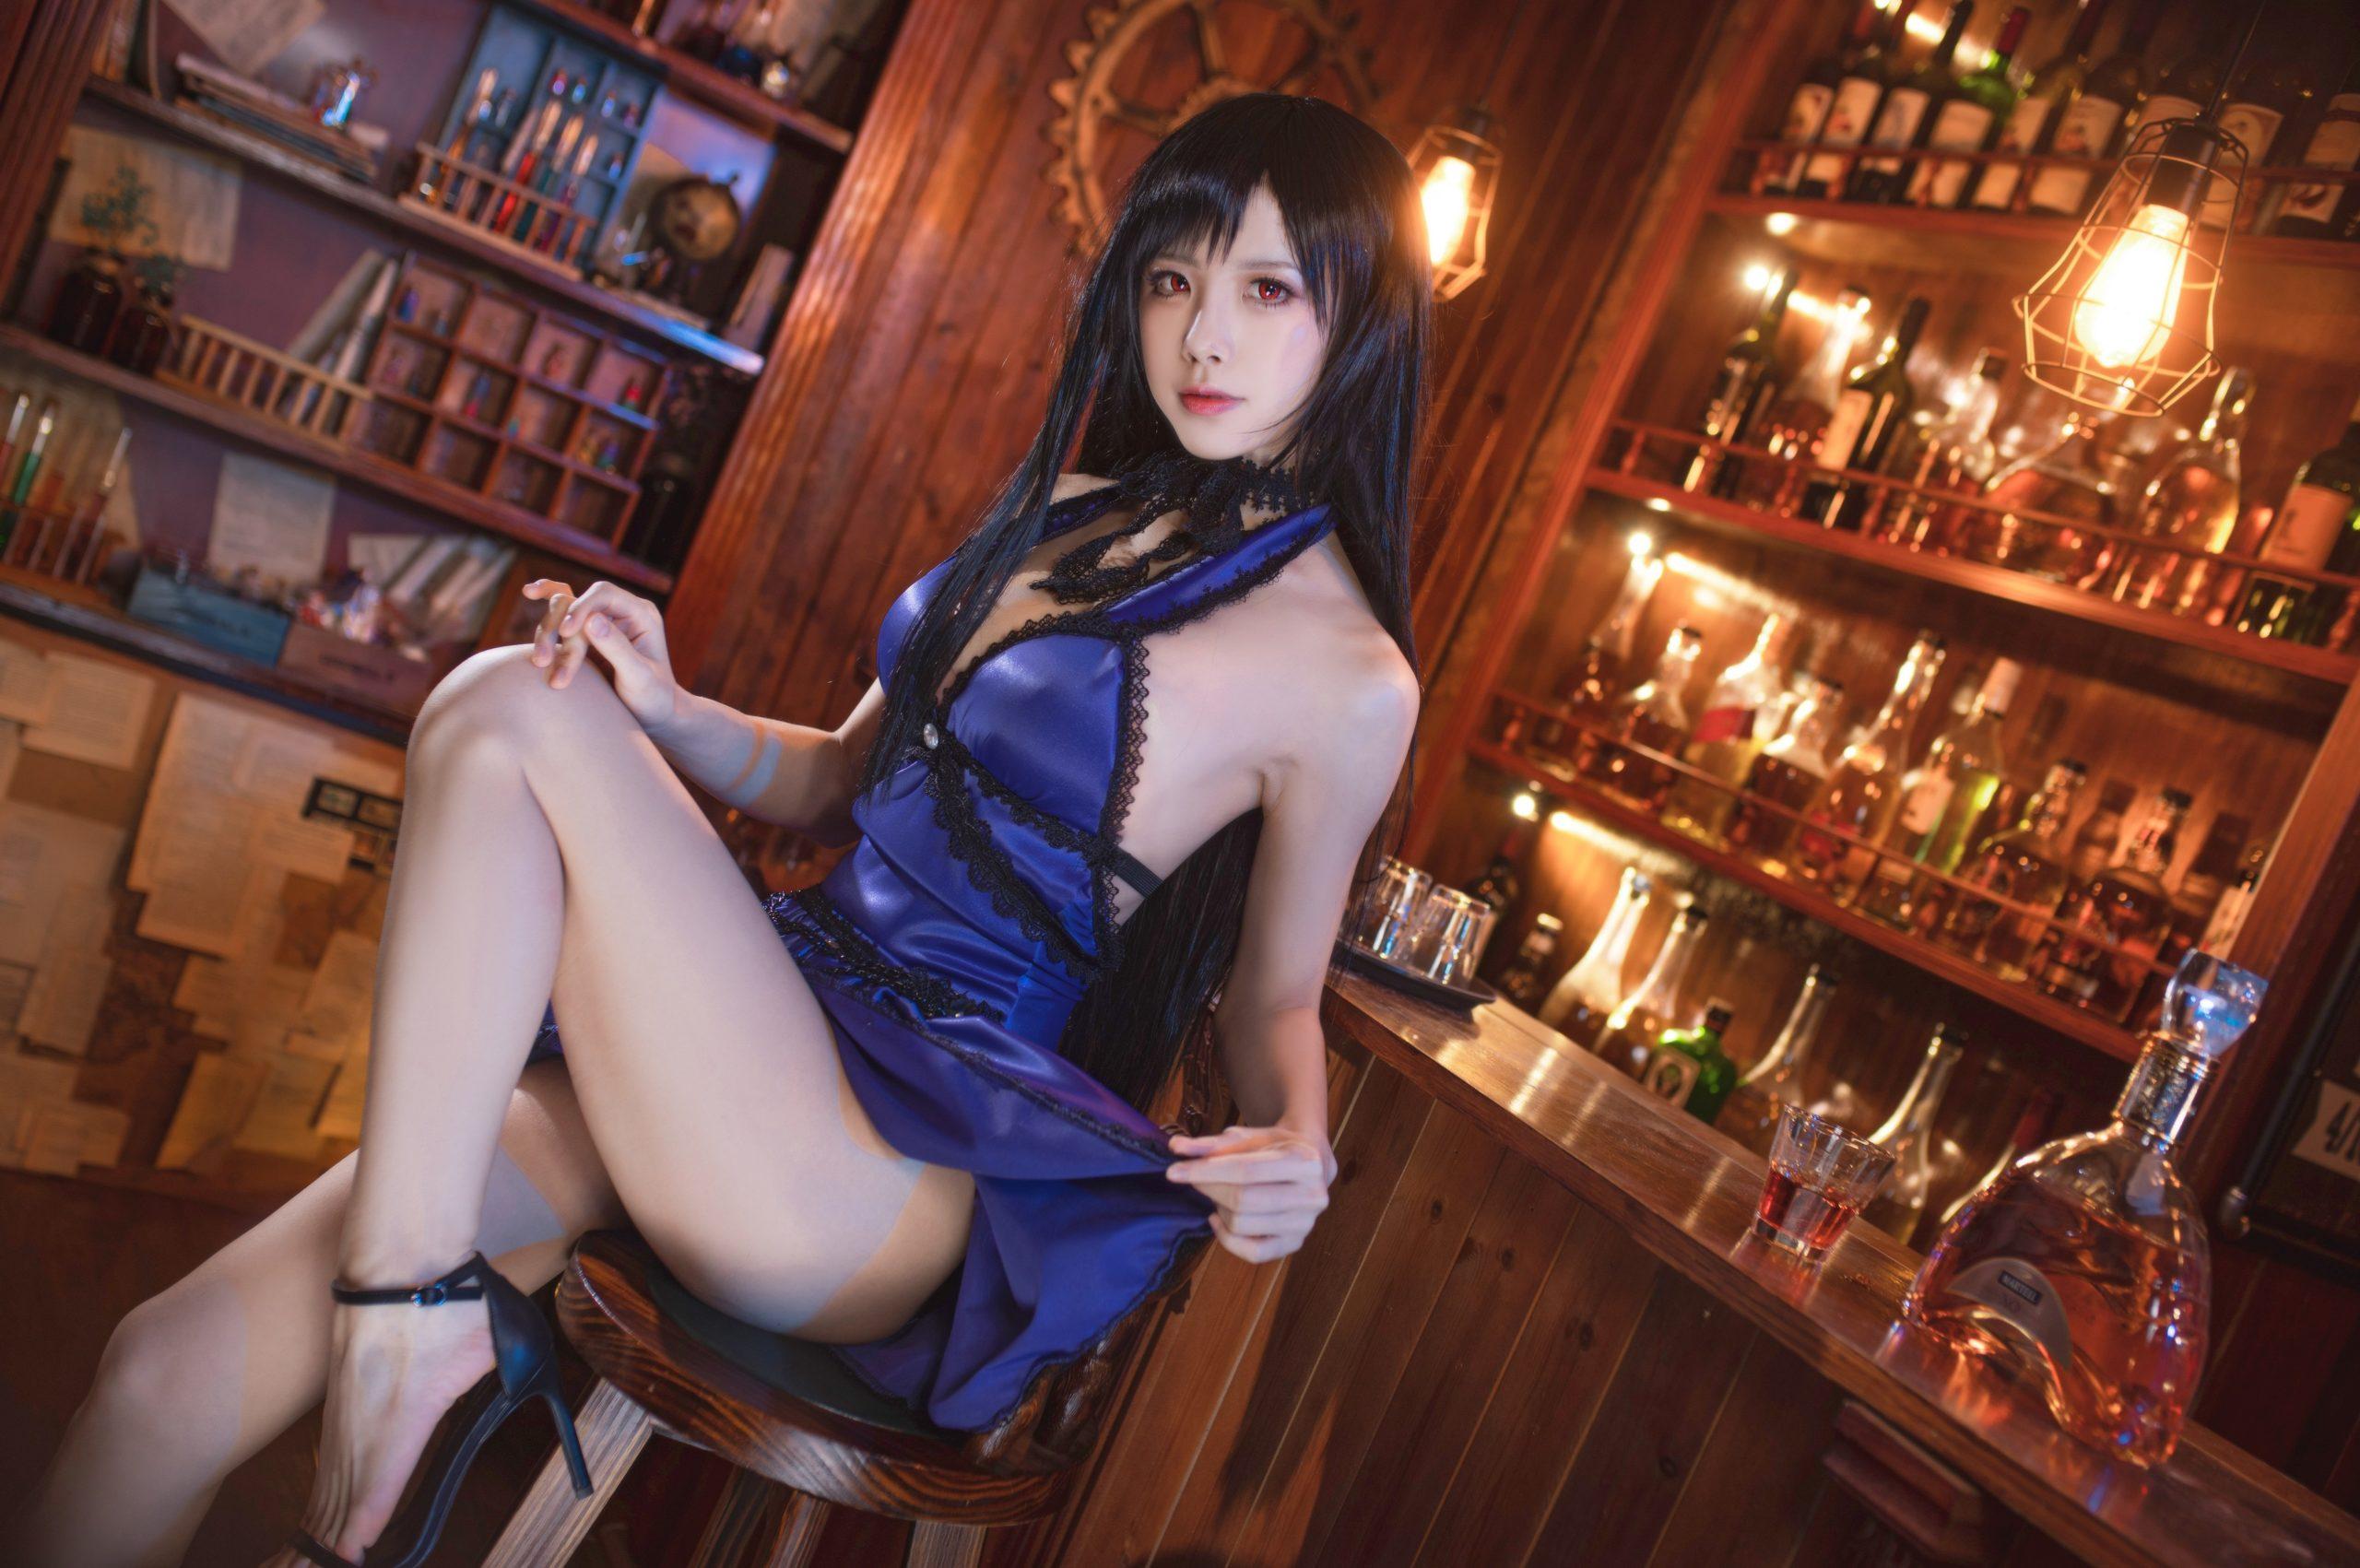 Final Fantasy VII Tifa Lockhart Night Dress Cosplay by Aqua Quite Inviting 24